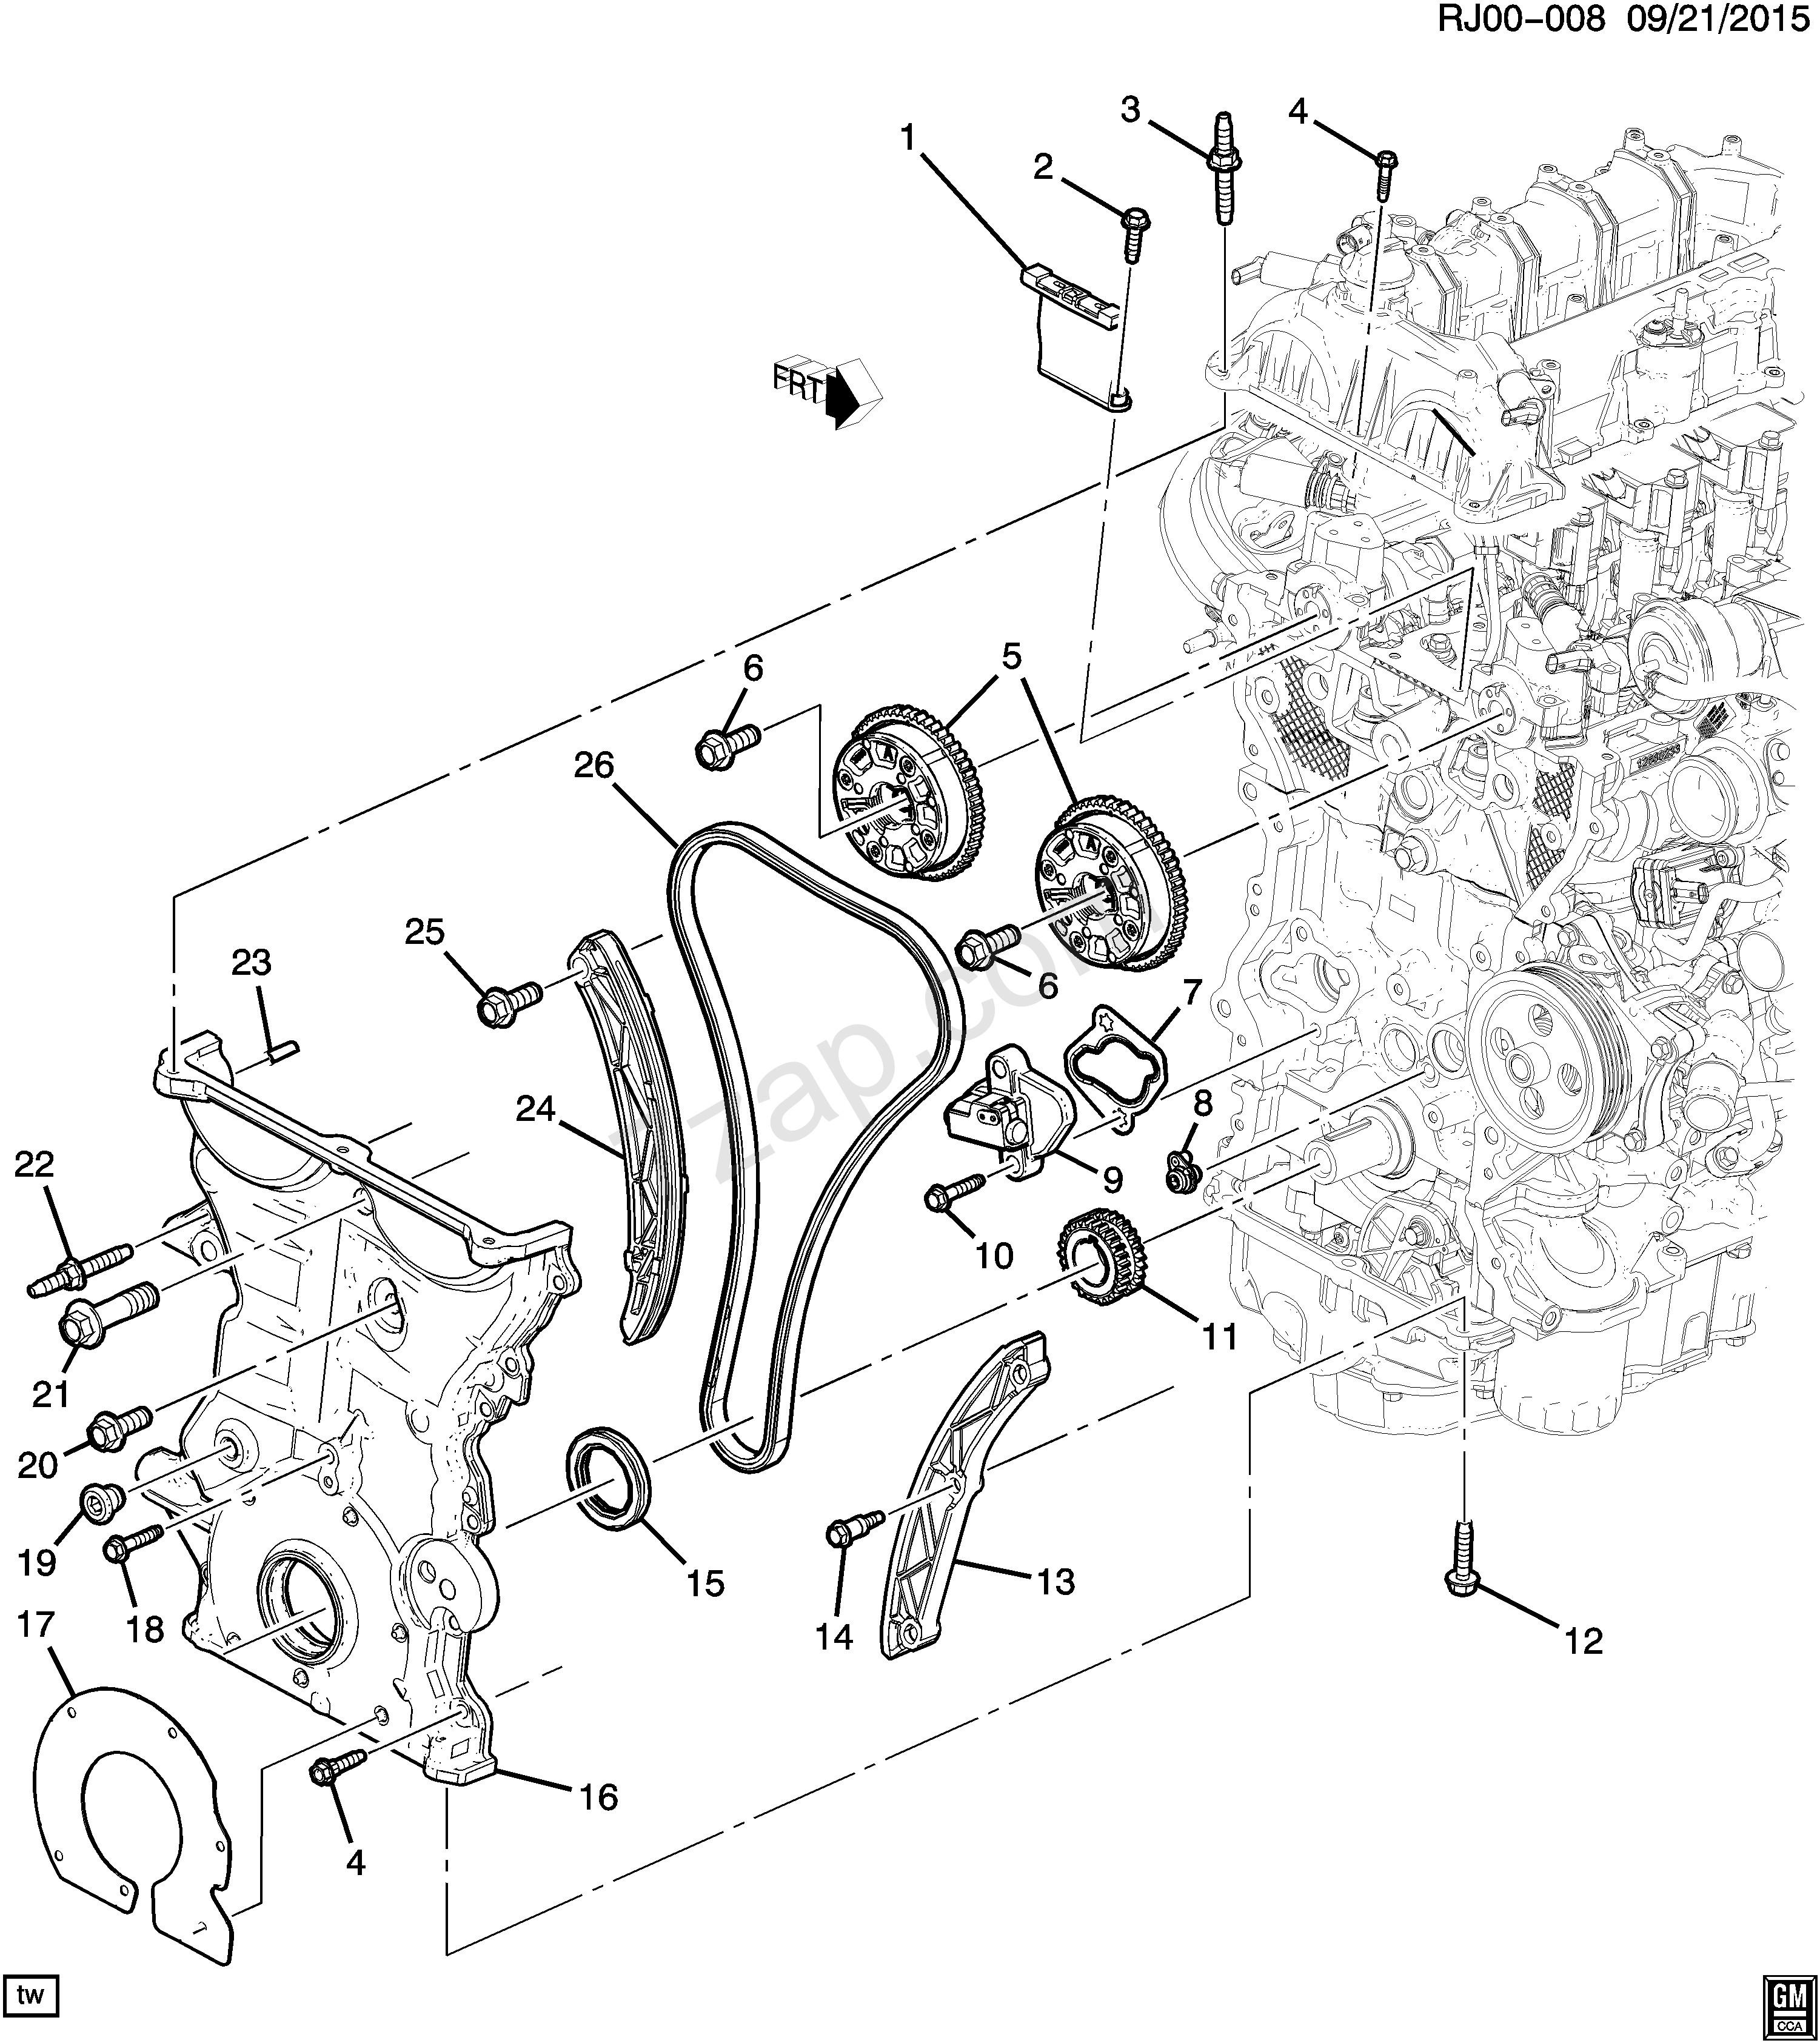 2001 Chevy Malibu 3 1 Engine Diagram 2017 2017 Zb Zc Zd69 Engine asm 1 5l L4 Part 3 Front Cover & Timing Of 2001 Chevy Malibu 3 1 Engine Diagram